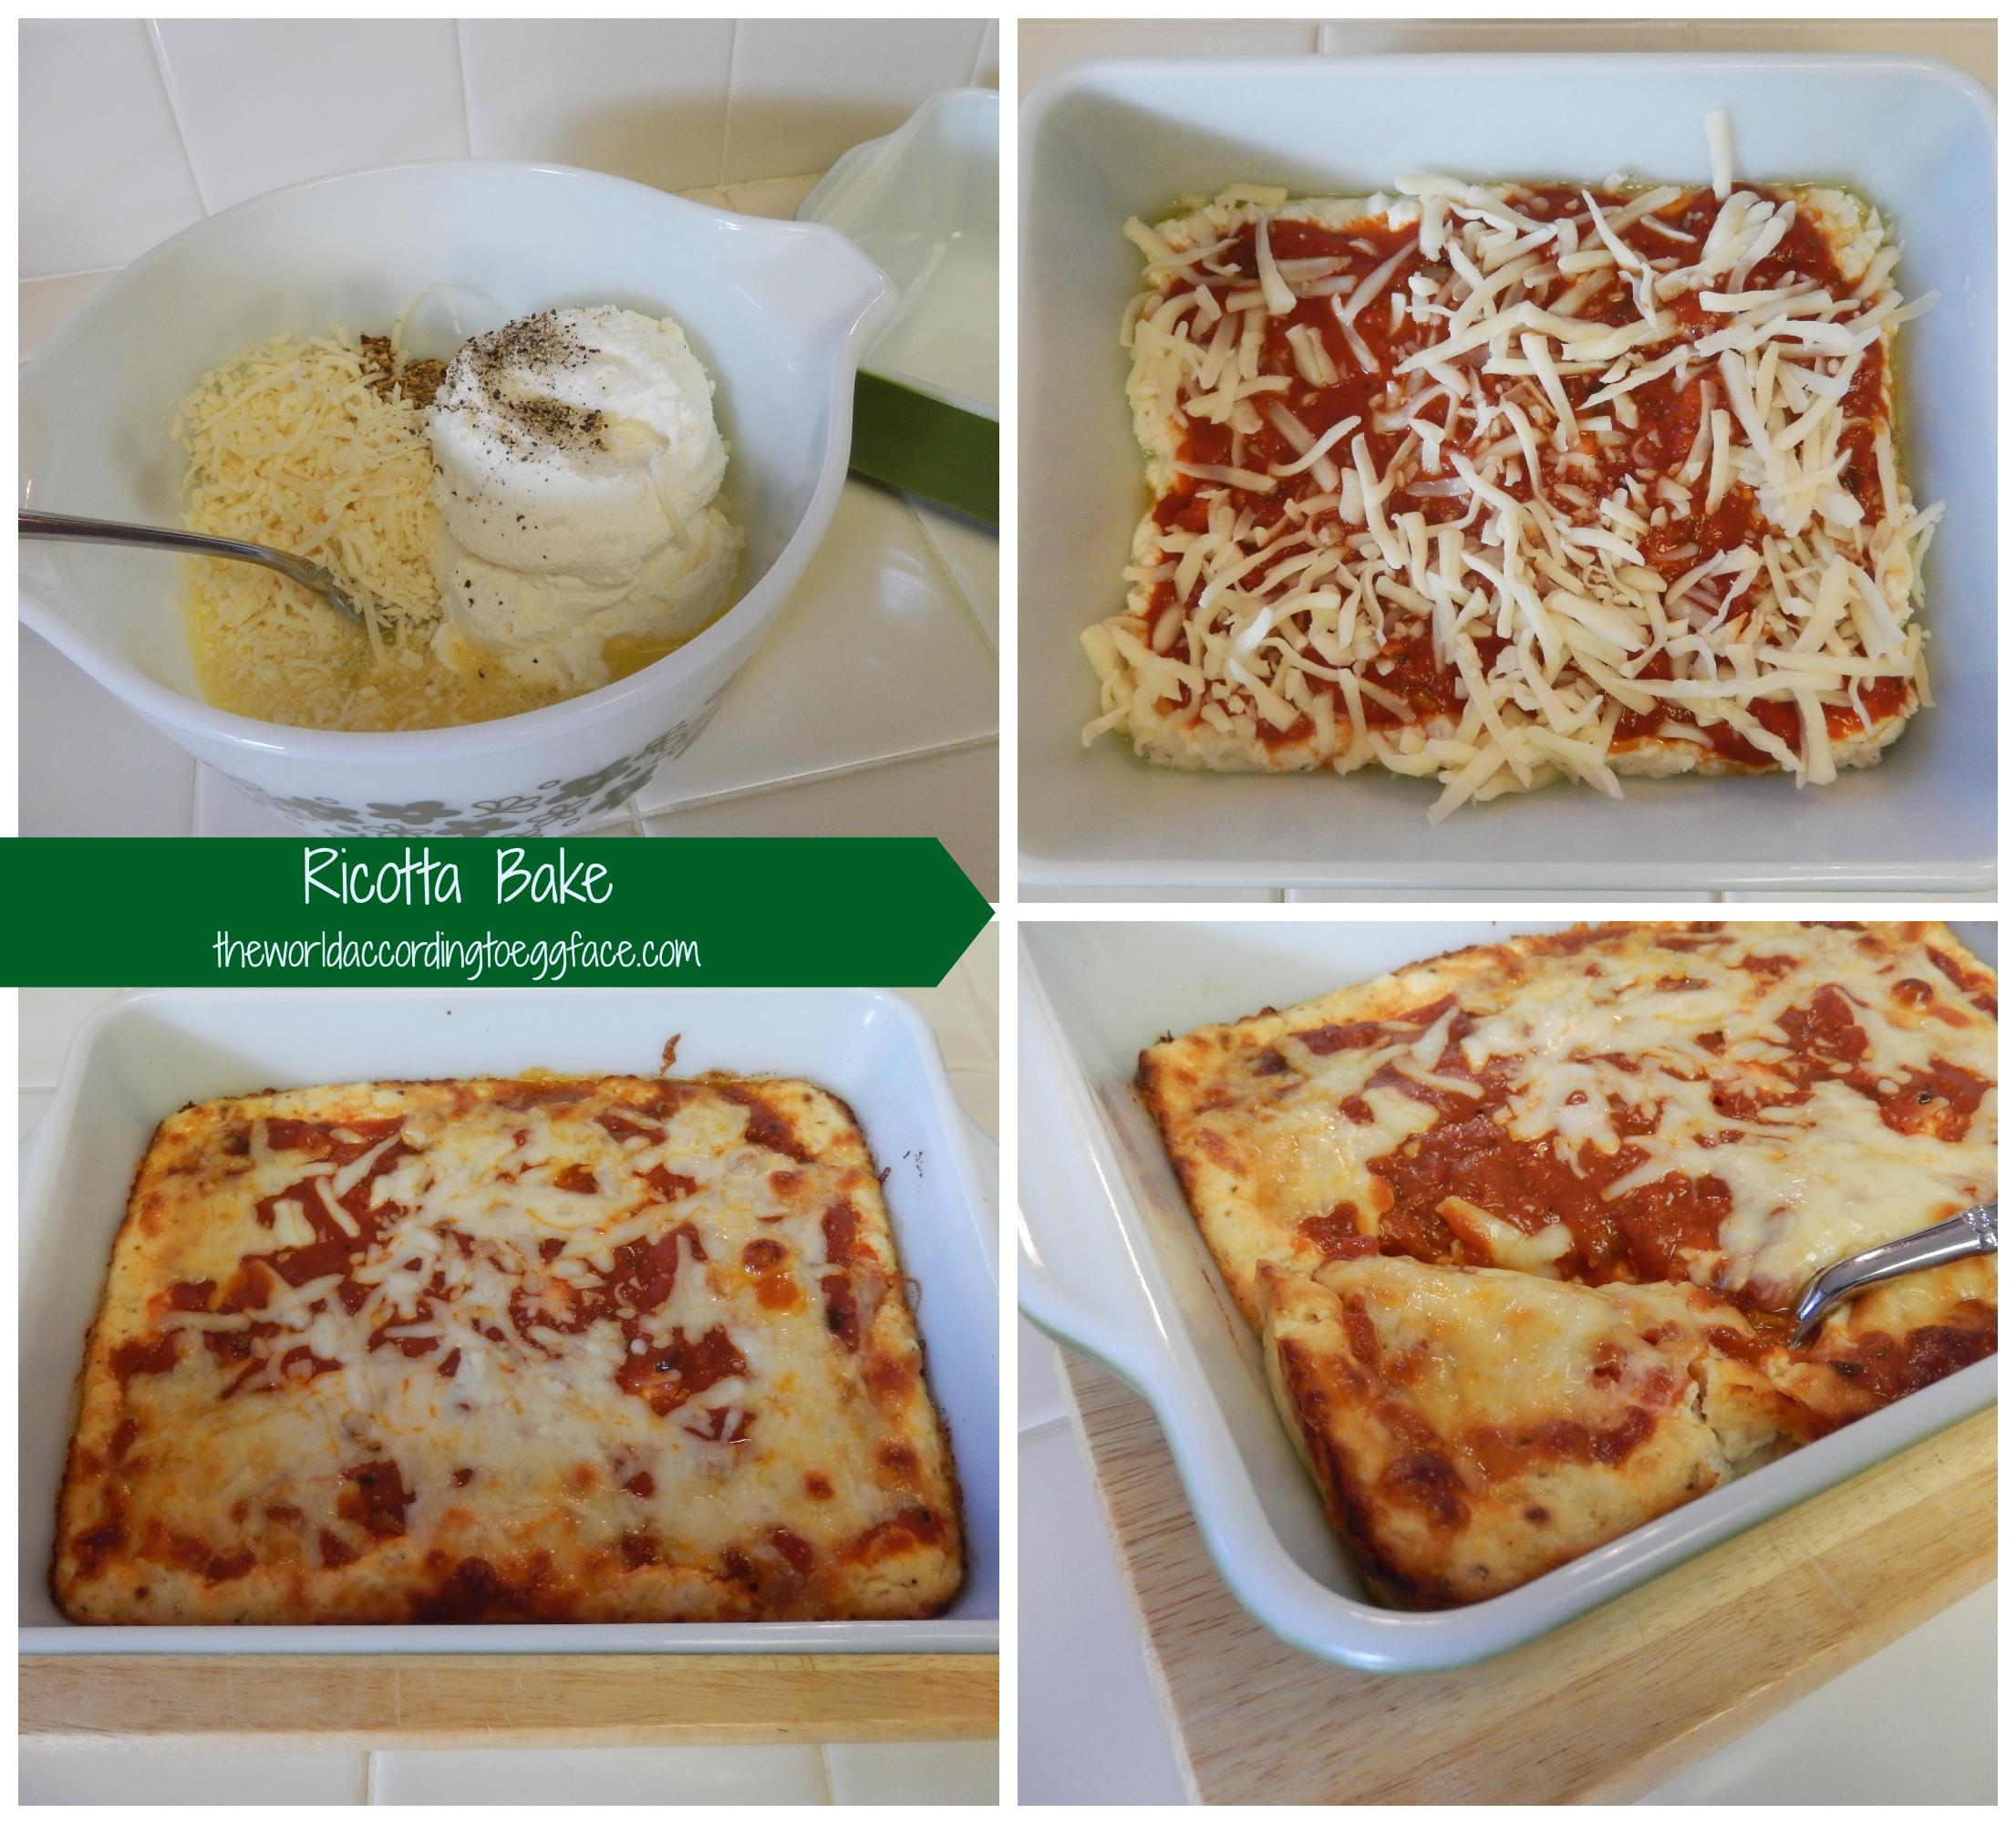 Shellys Baked Ricotta Recipe - Genius Kitchen